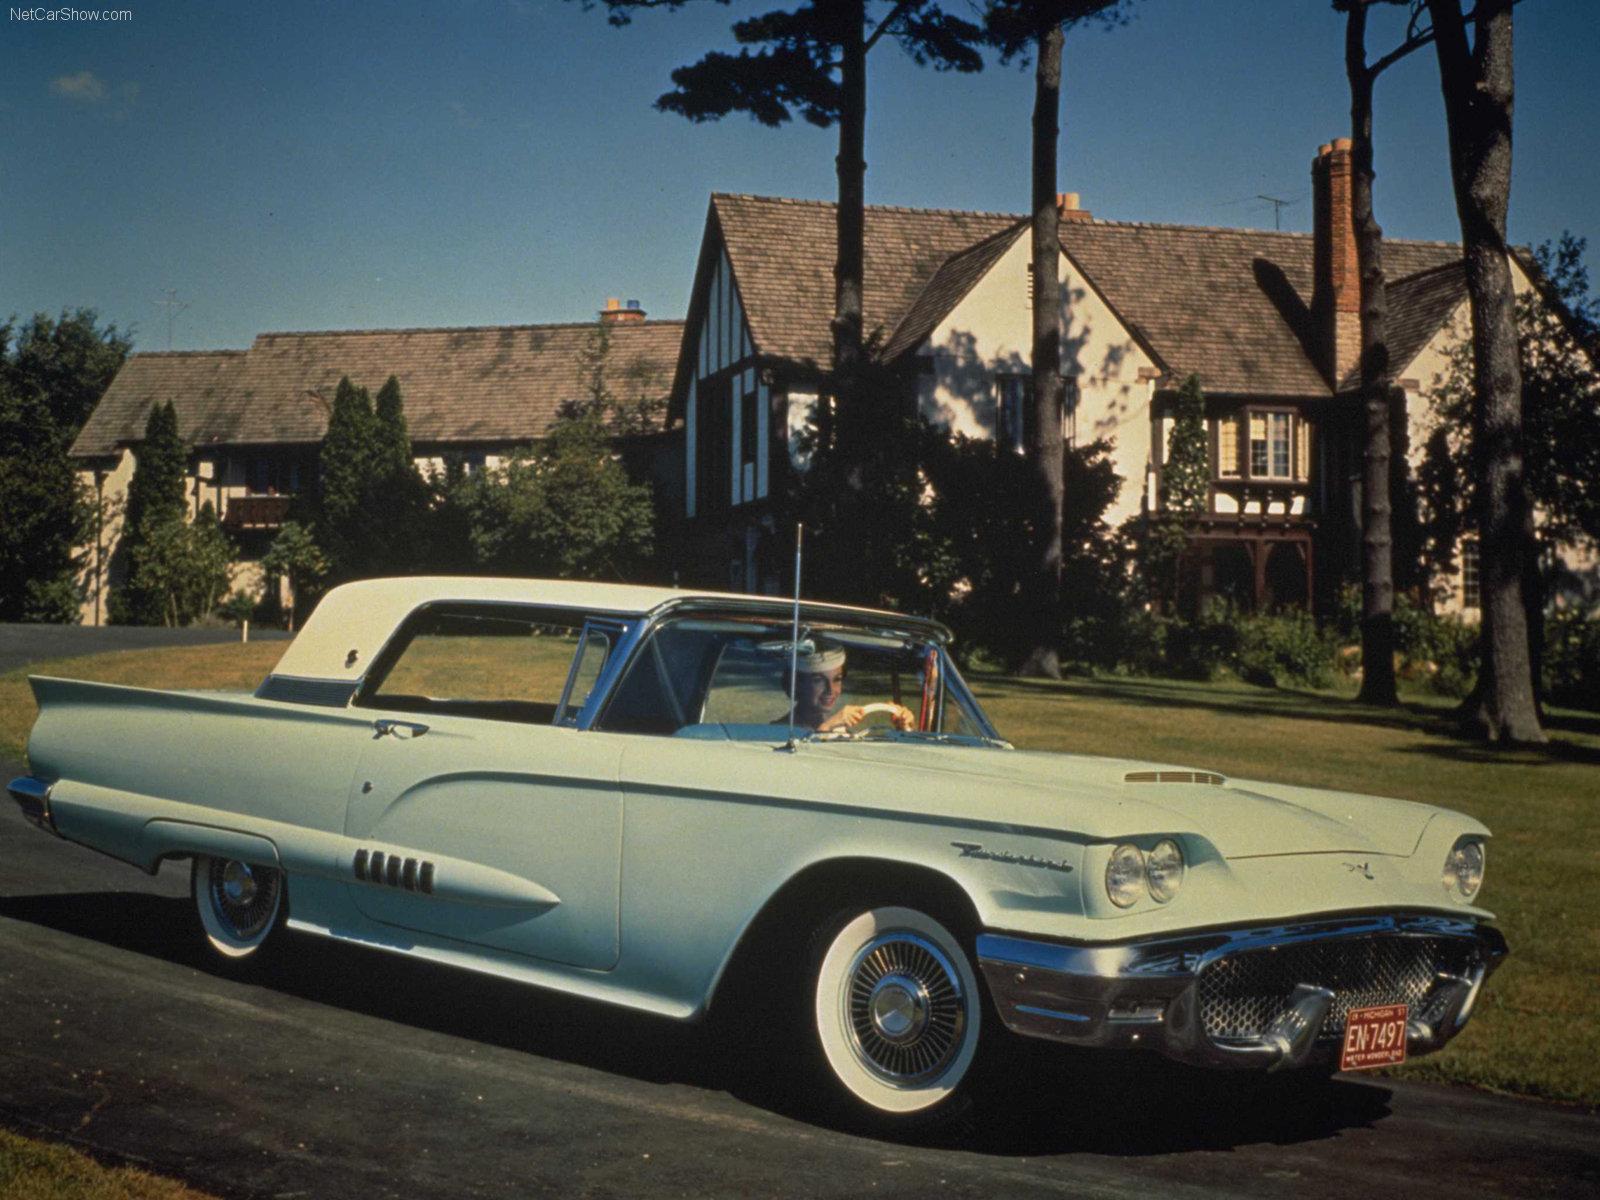 Ford Thunderbird photos Gallery with 42 pics CarsBase